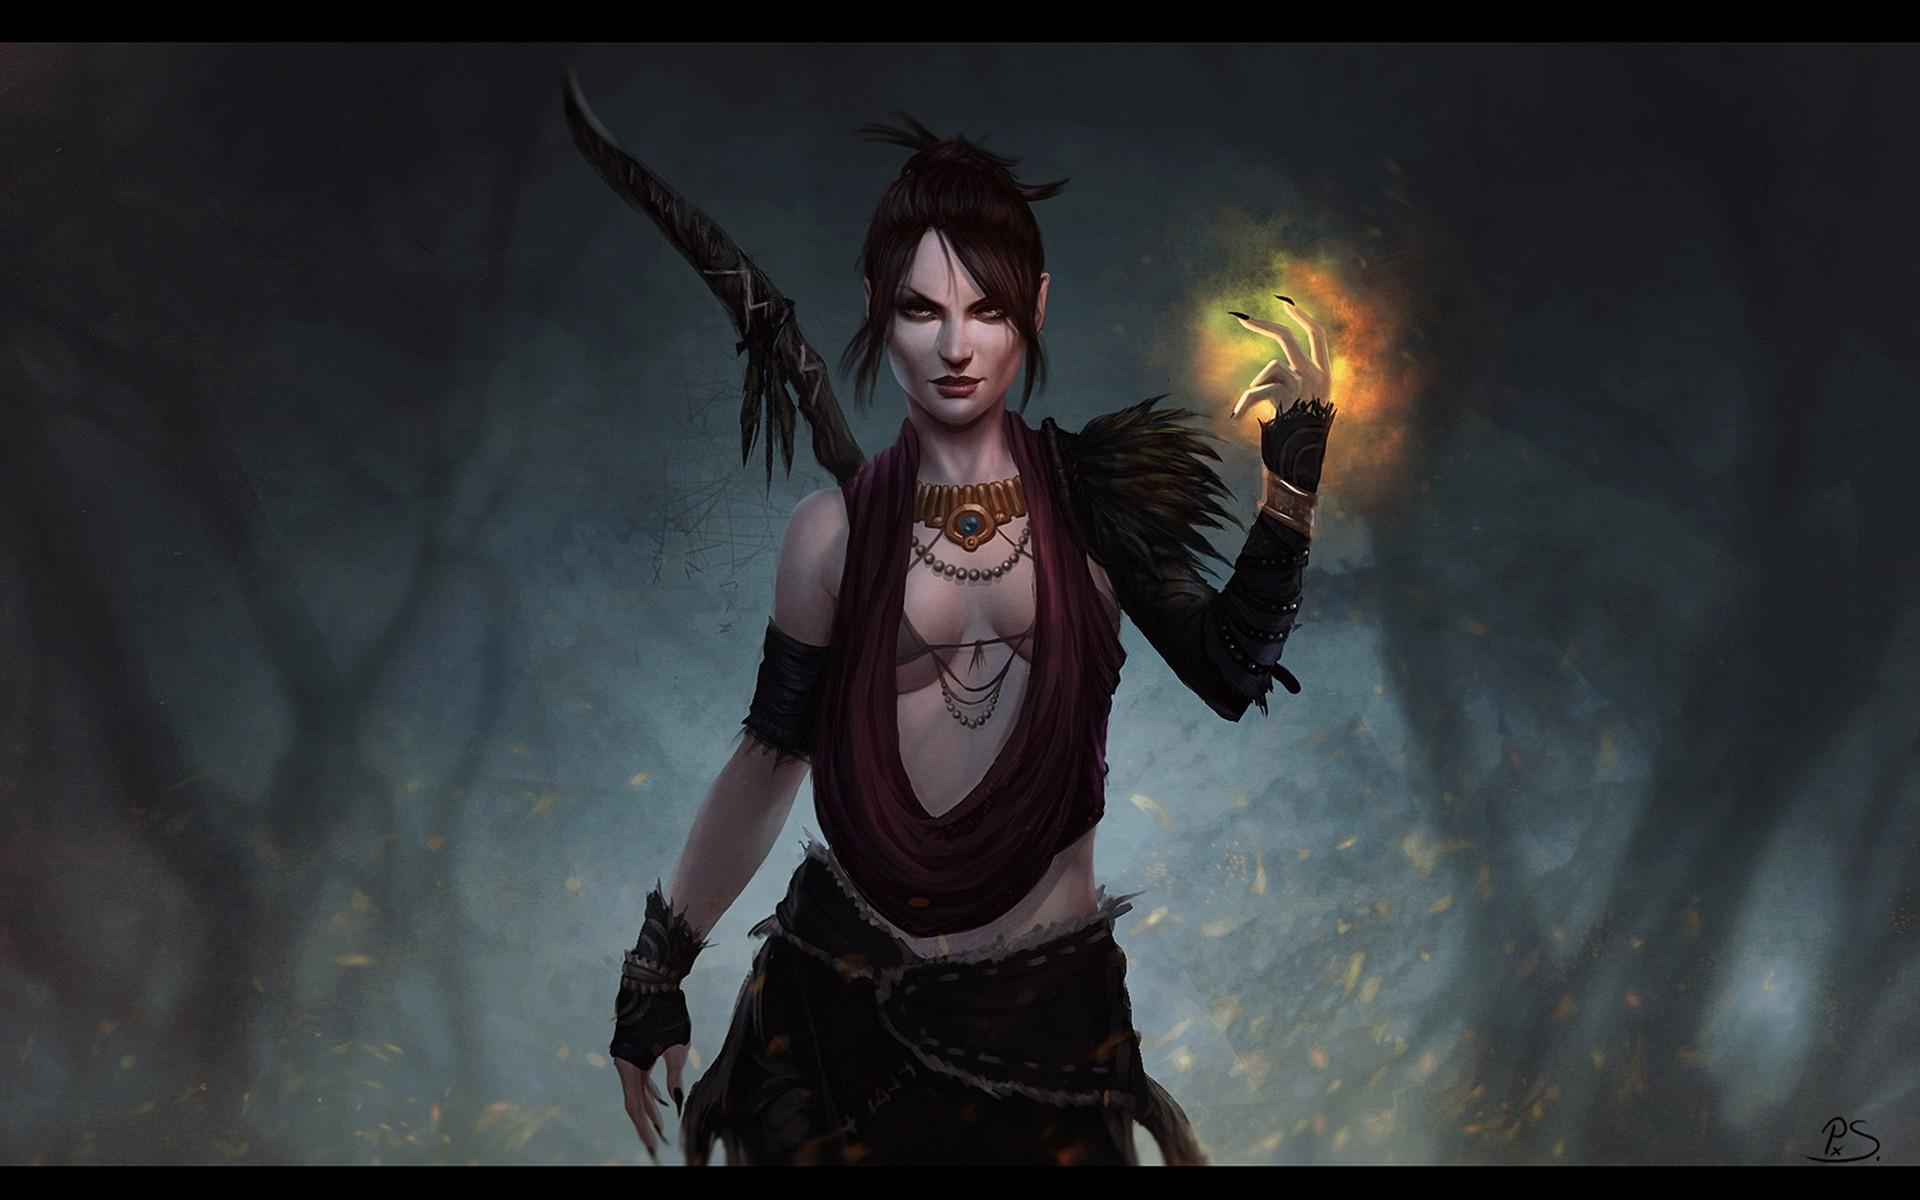 wallpaper : video games, fantasy art, fantasy girl, demon, dragon